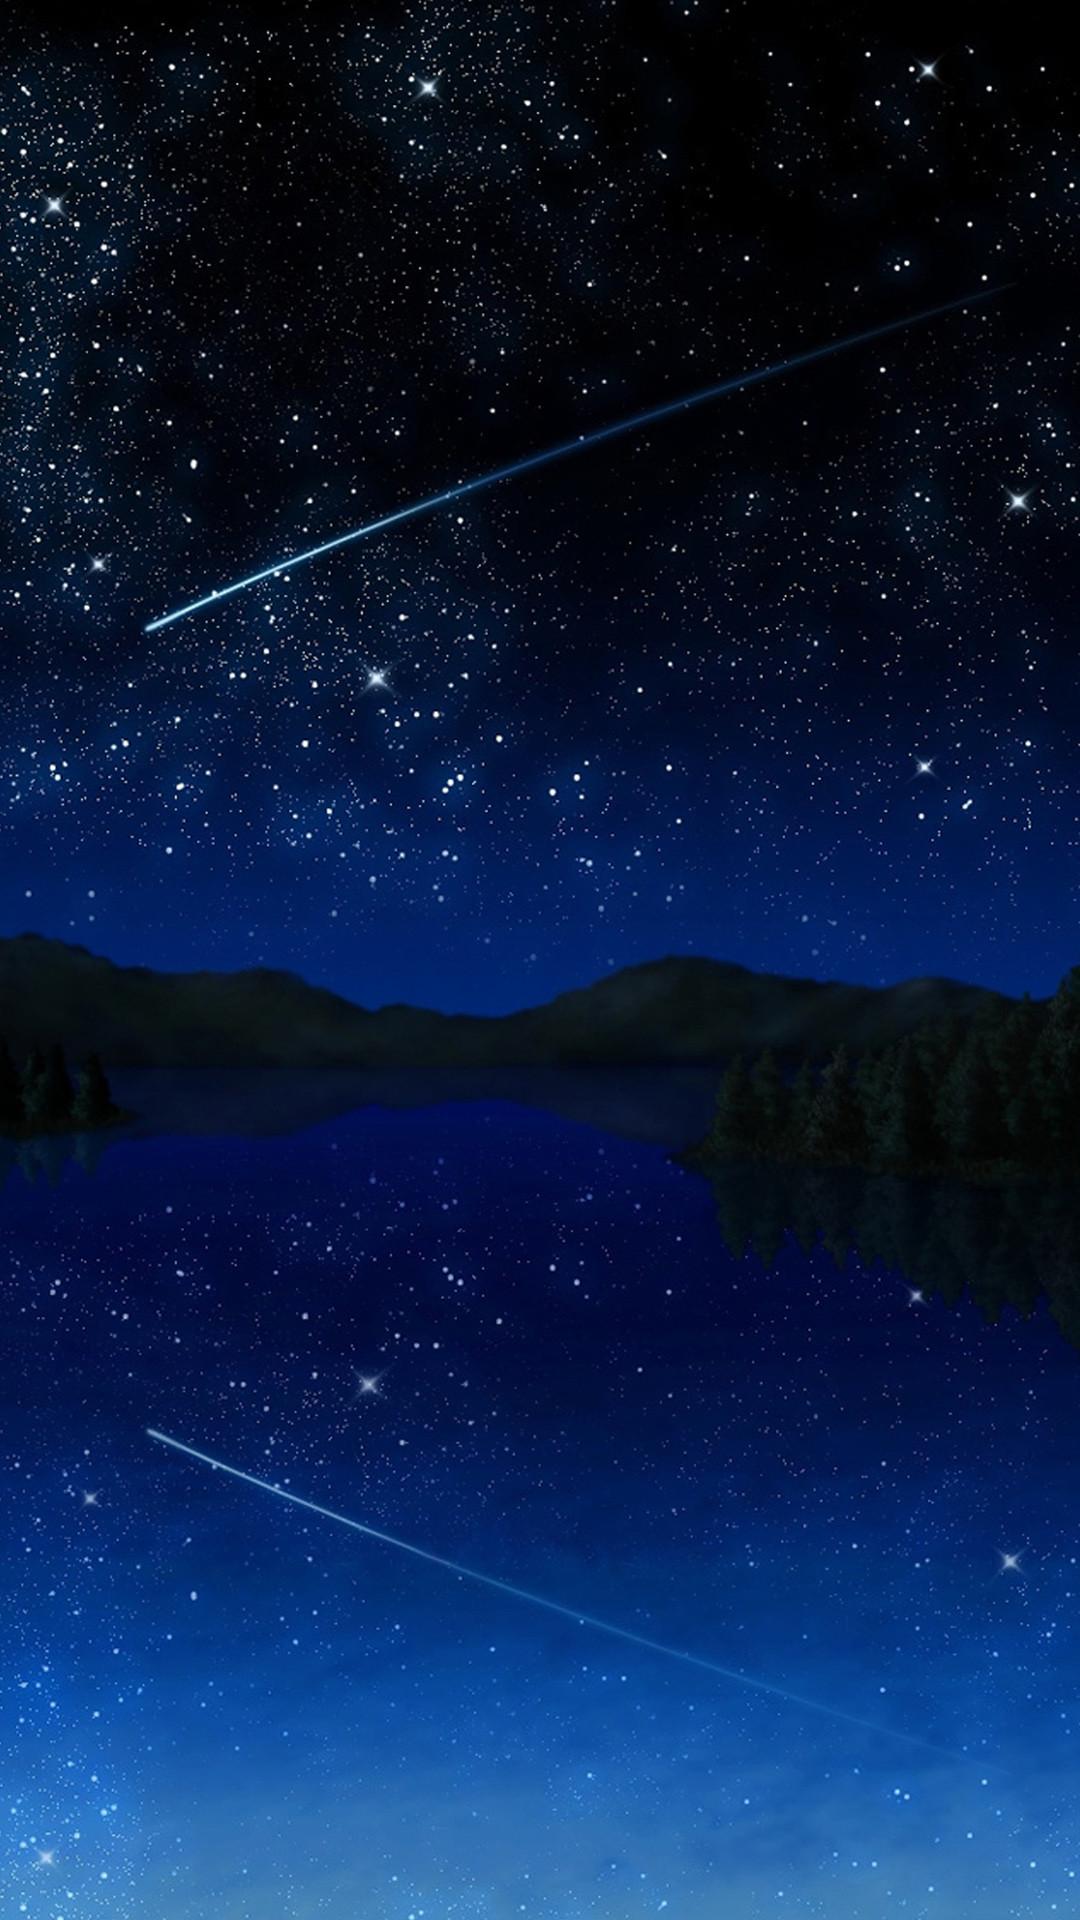 Res: 1080x1920, Shooting Star Sky Samsung Wallpaper